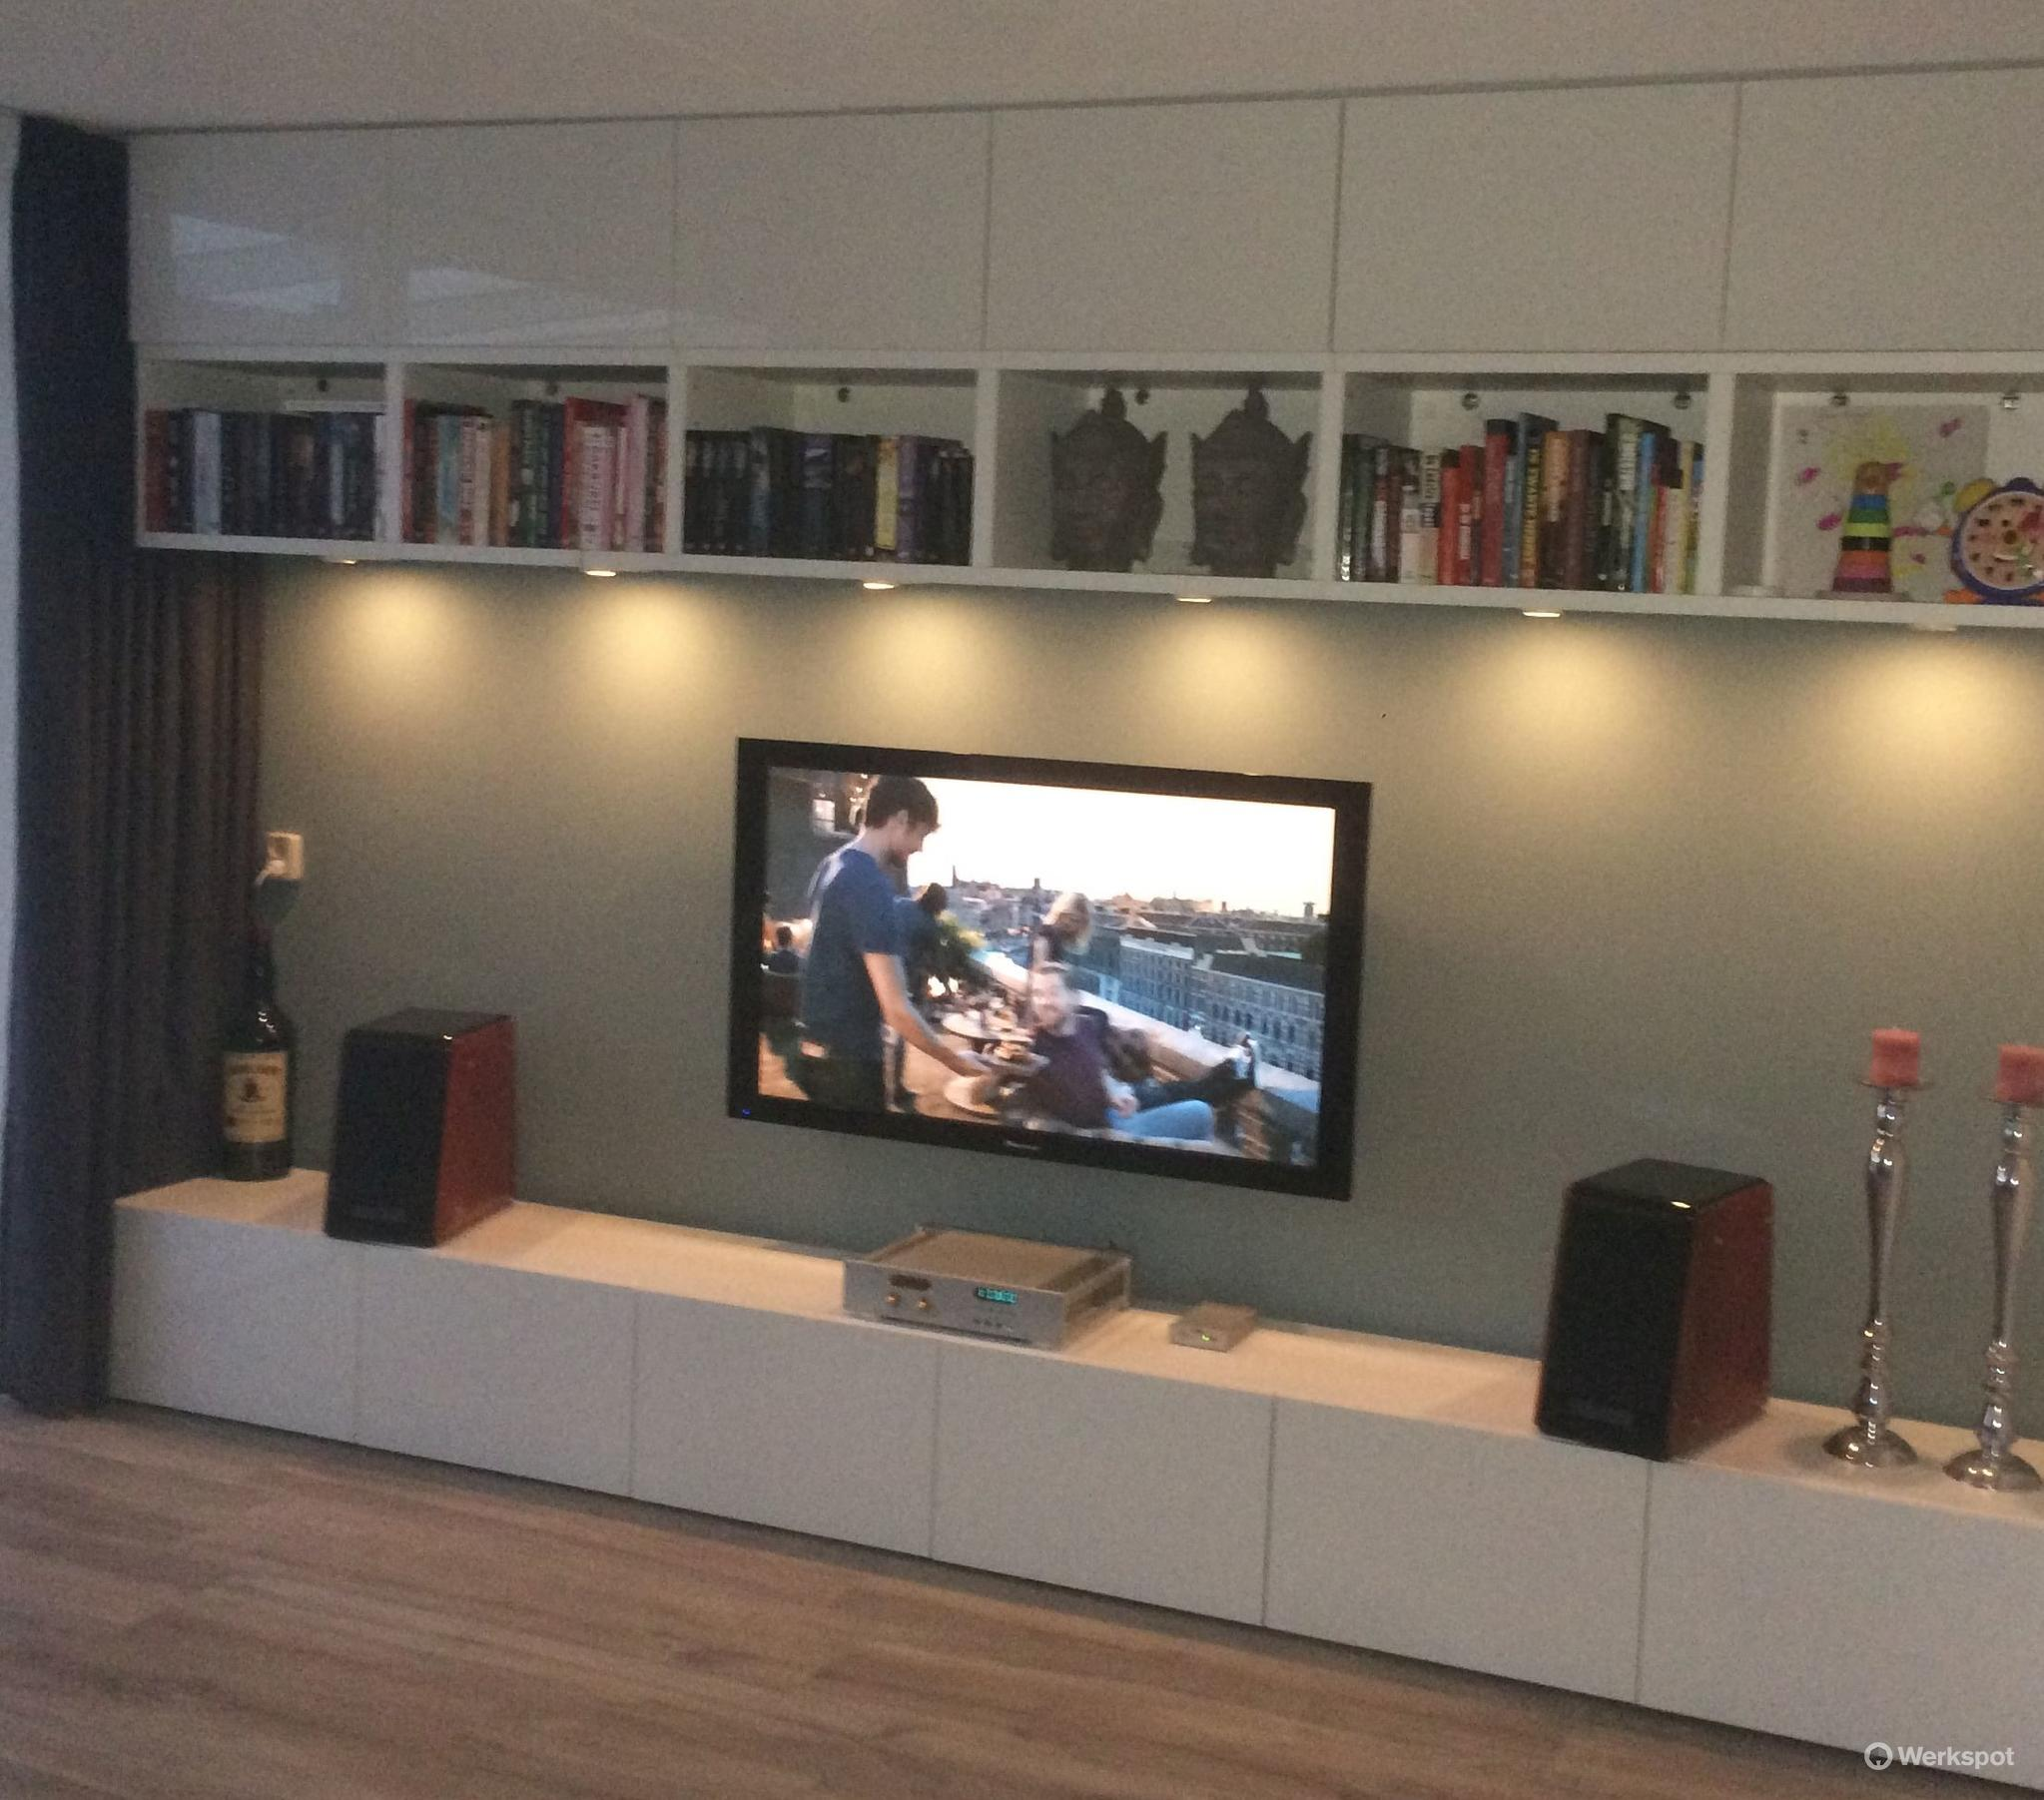 ikea besta zwevend ophangen werkspot. Black Bedroom Furniture Sets. Home Design Ideas